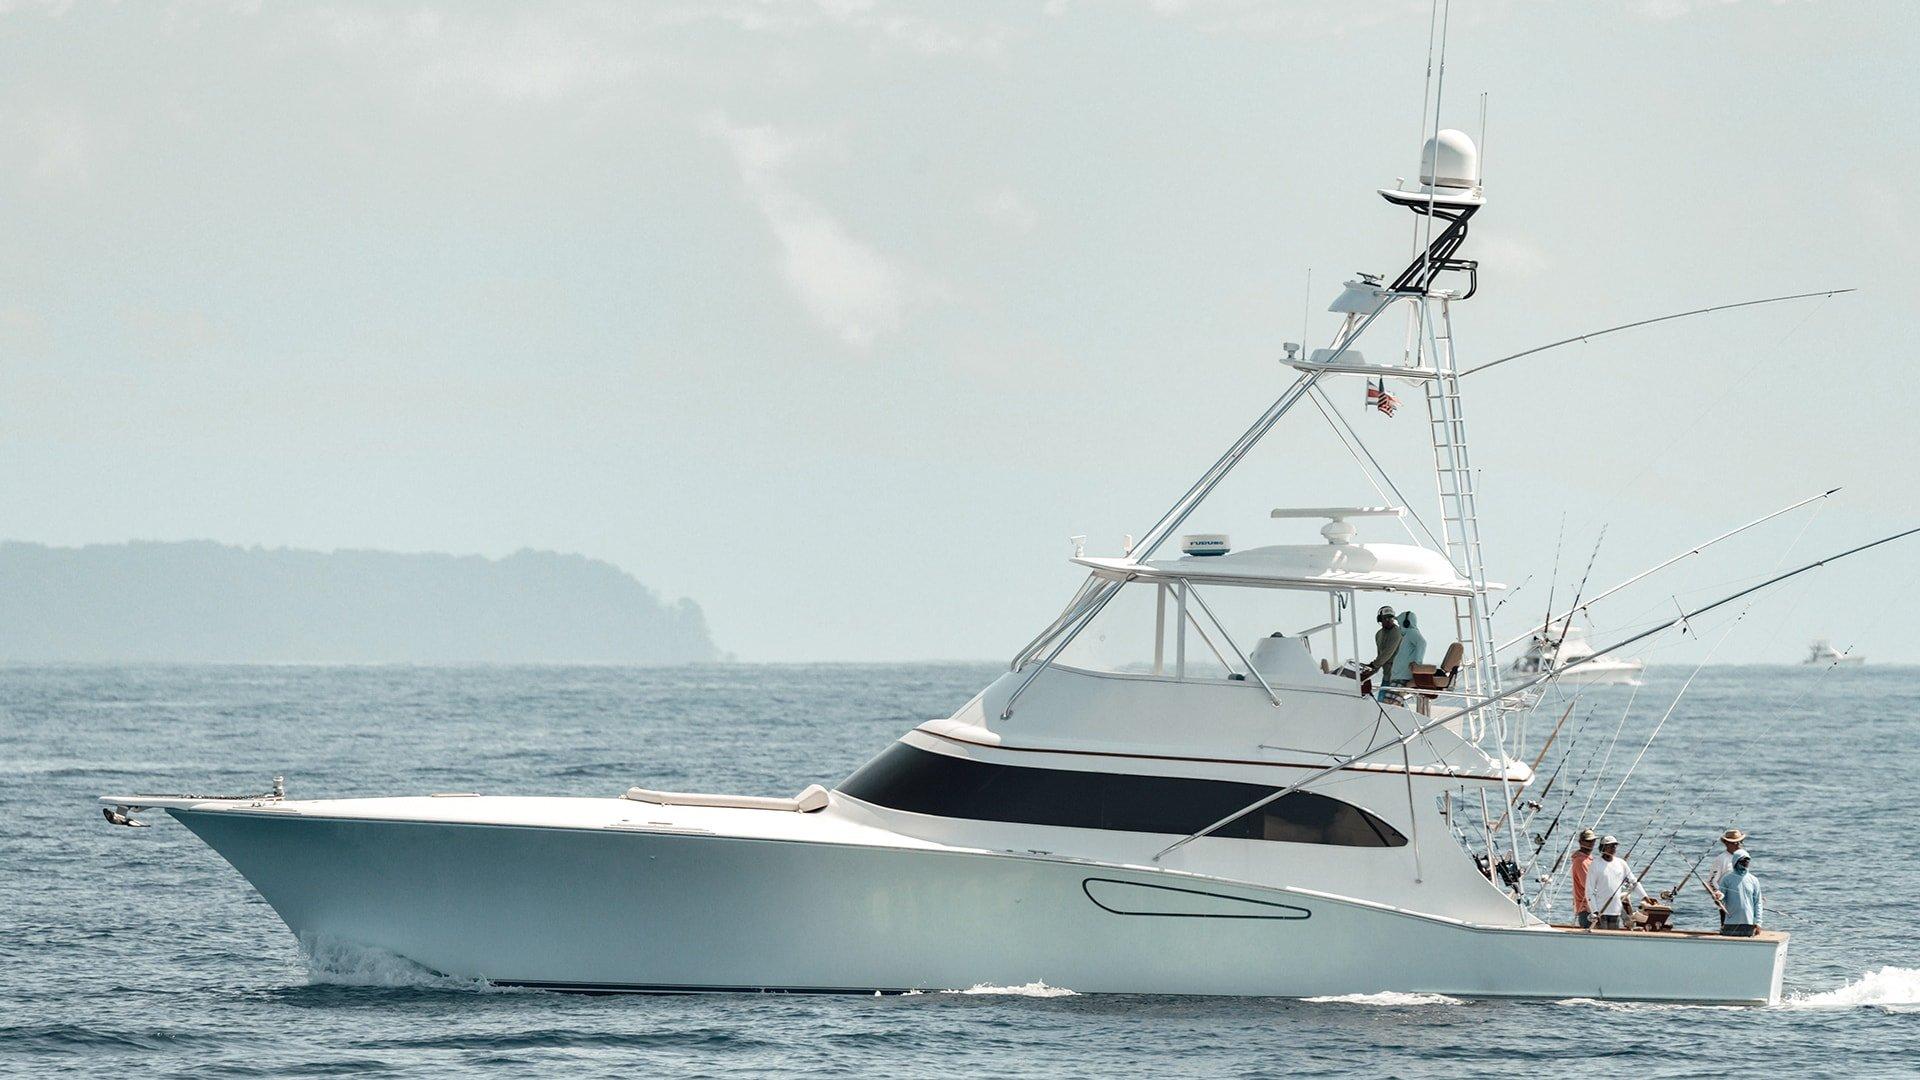 Pelagic Rockstar Fishing Tournament Costa Rica